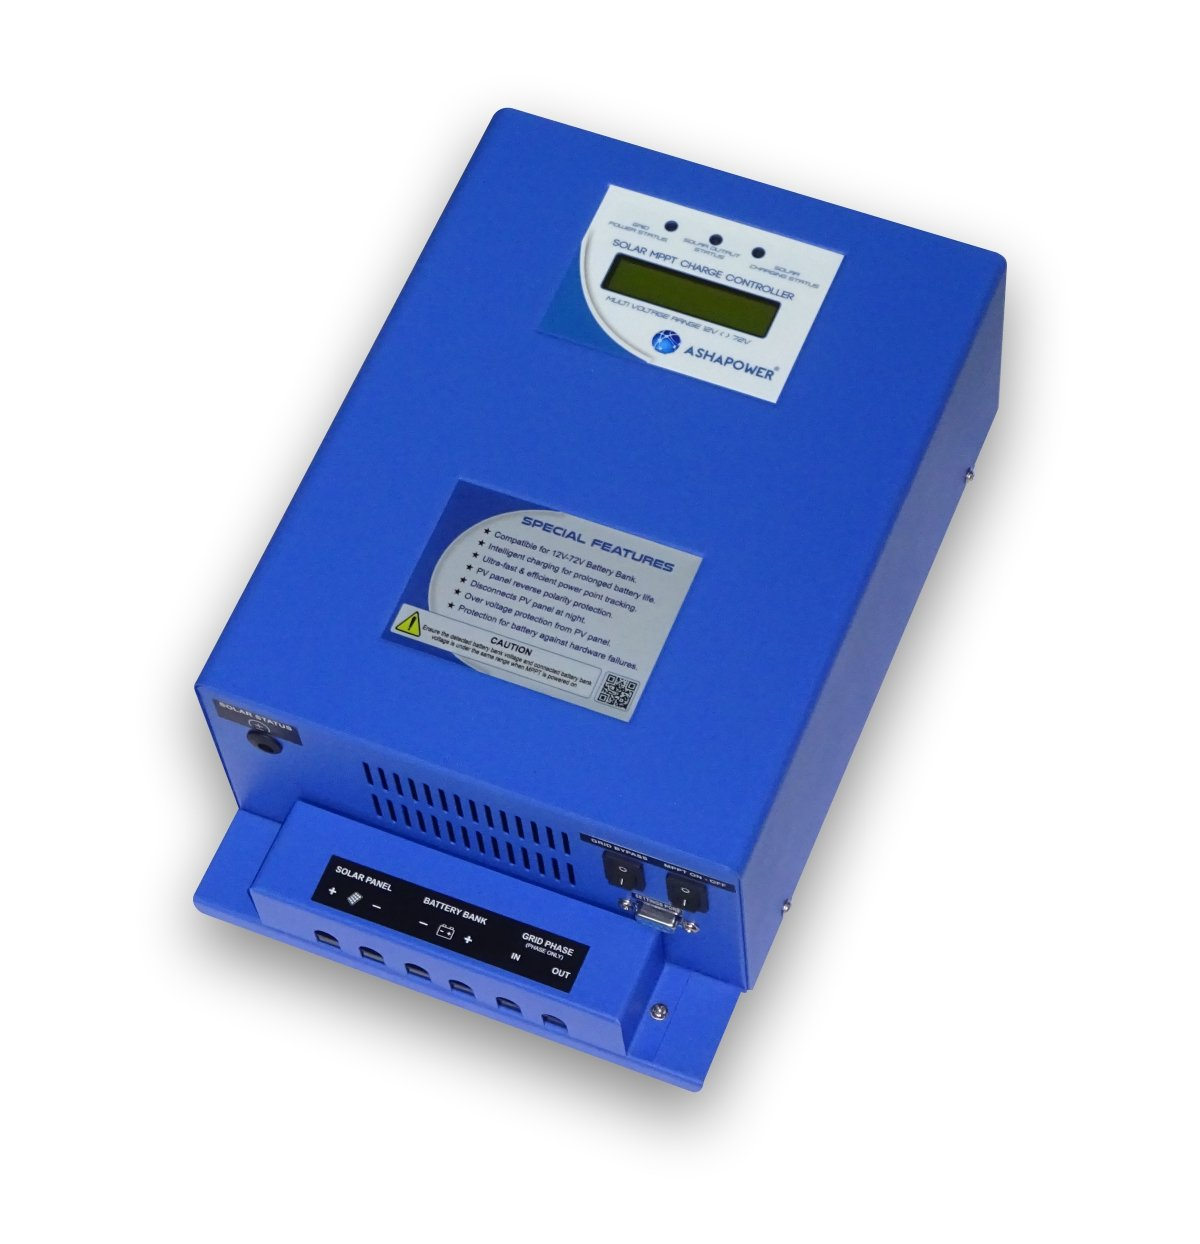 Ashapower Solar Mppt Charge Controller 24 36 48 60 72 V 40a Auto Circuit Buy Setting Apollo 40 Blue Garden Outdoors